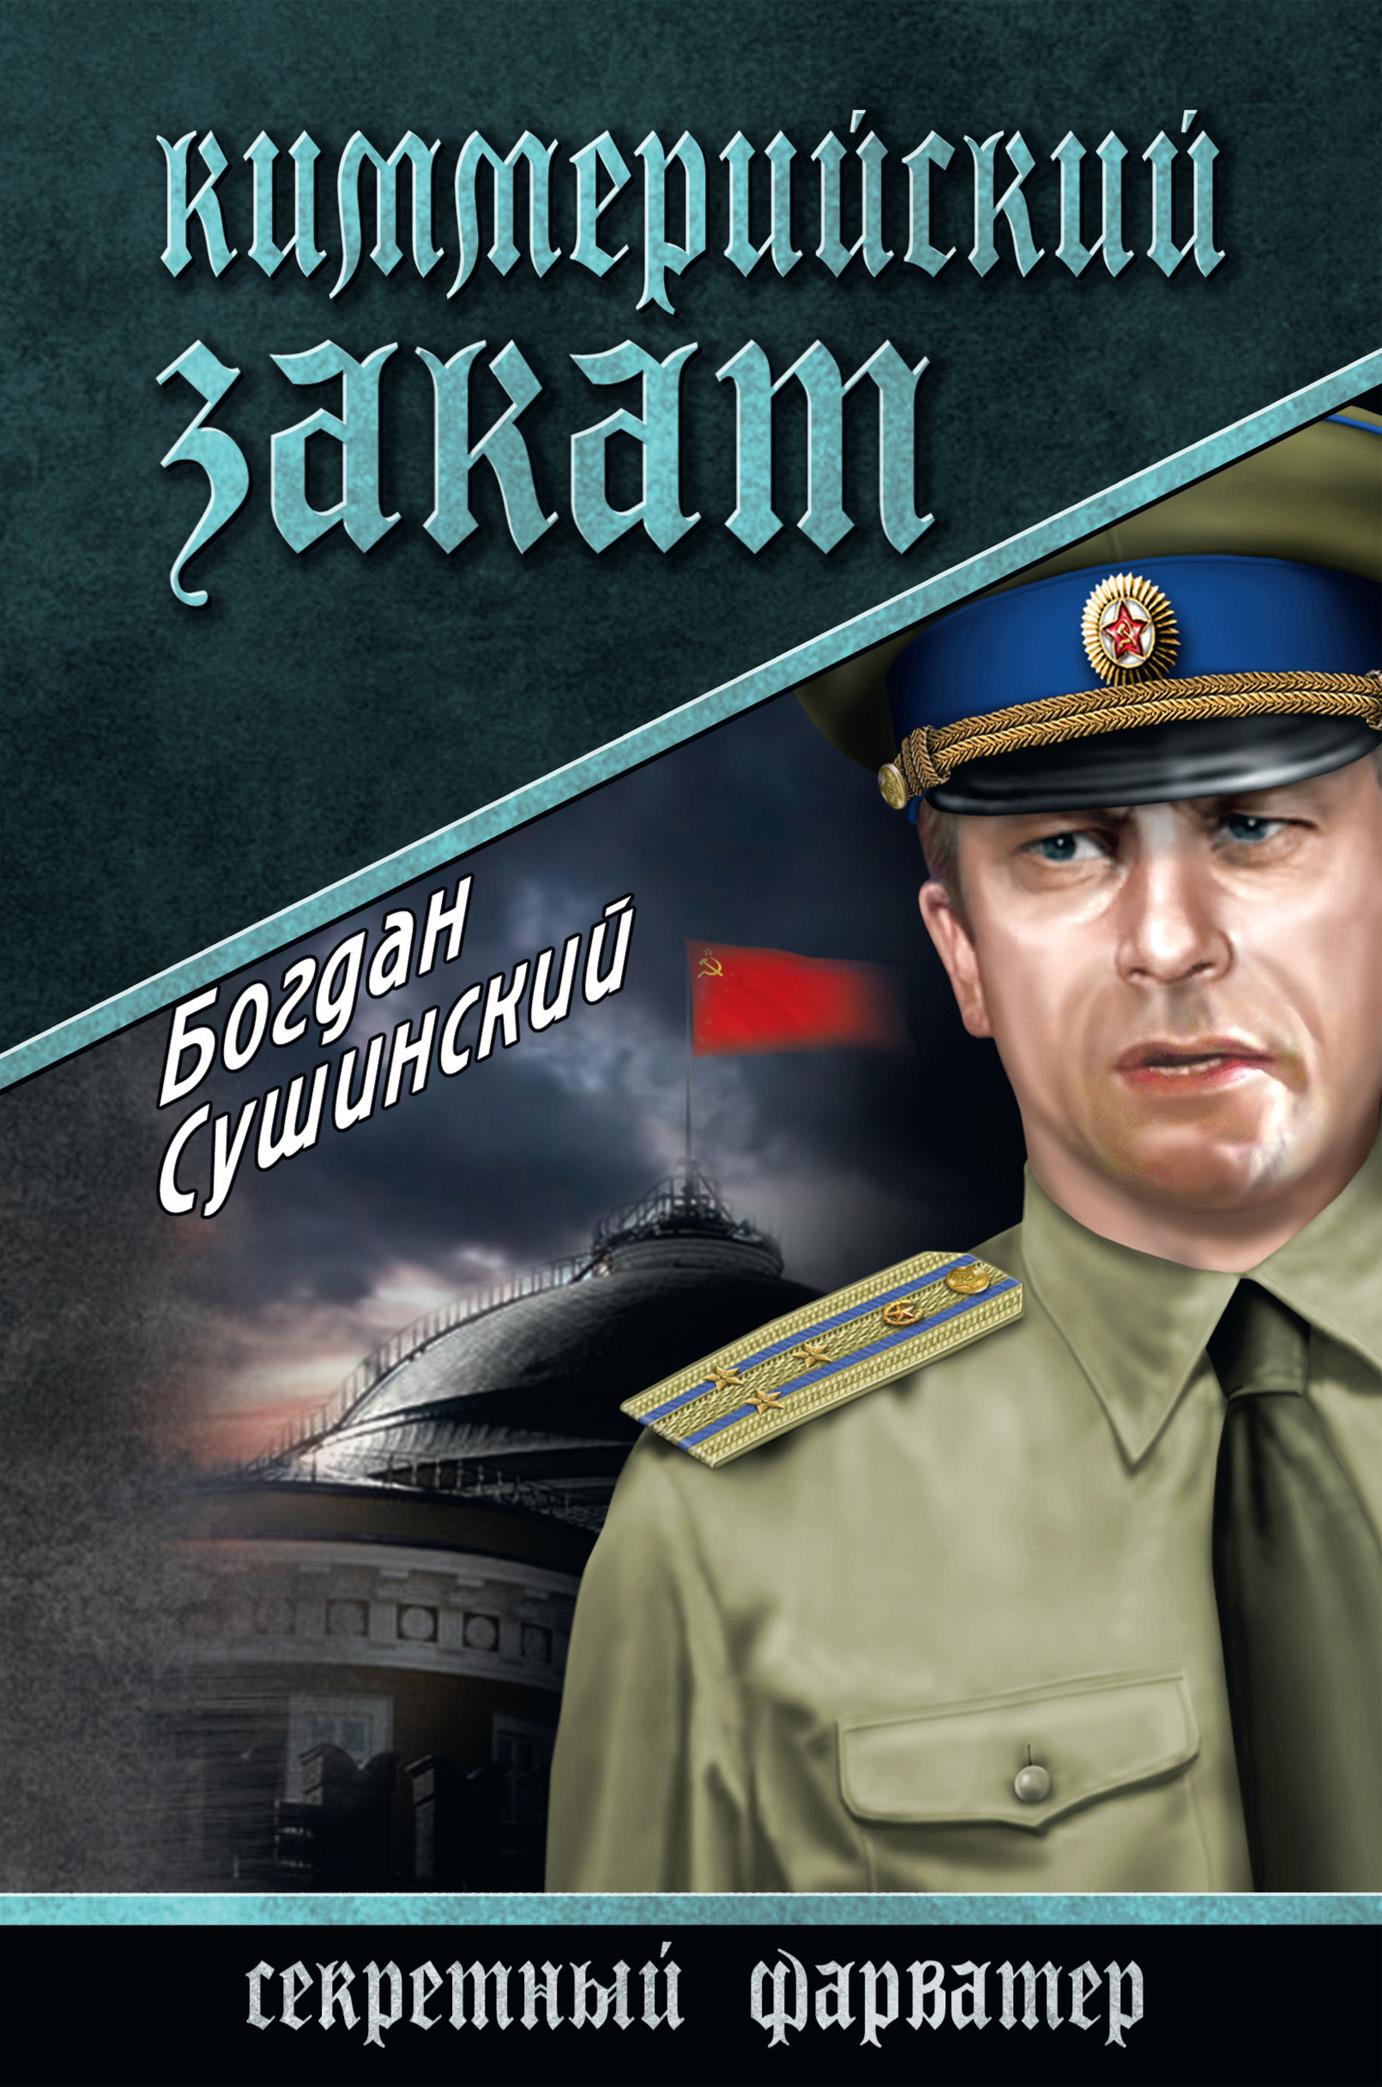 Богдан Сушинский Киммерийский закат богдан сушинский киммерийский закат